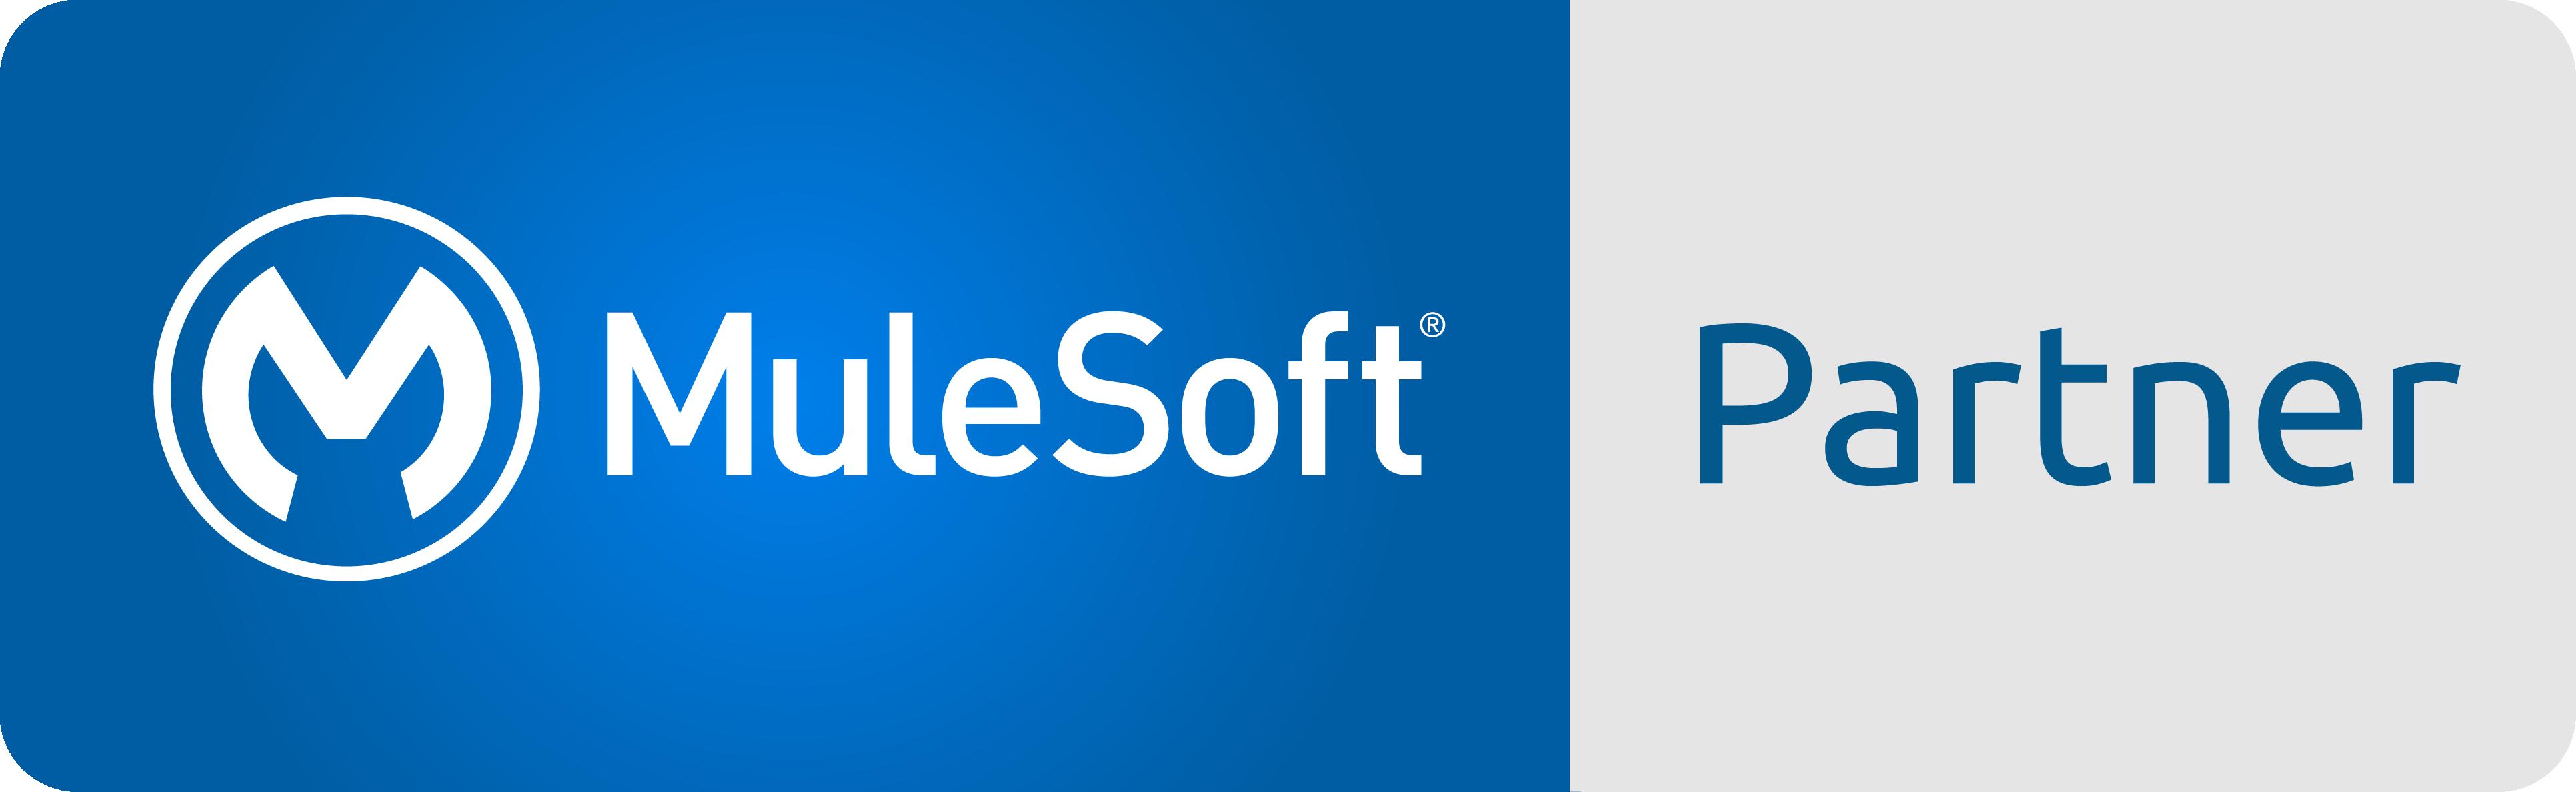 MuleSoft Inc company